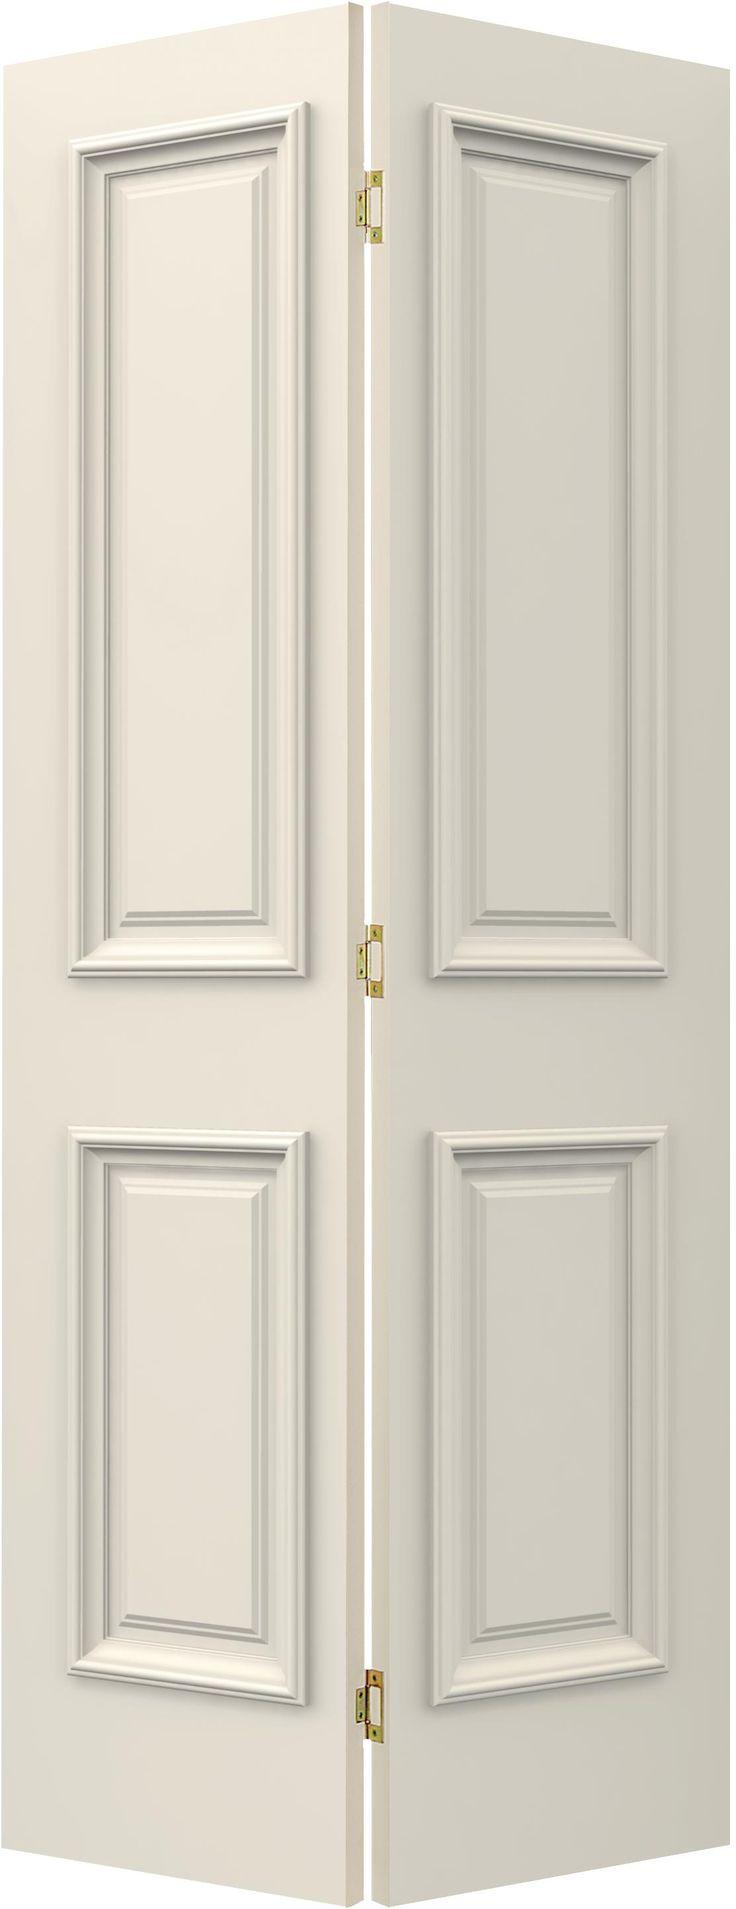 10 Ideas About Bifold Interior Doors On Pinterest Bi